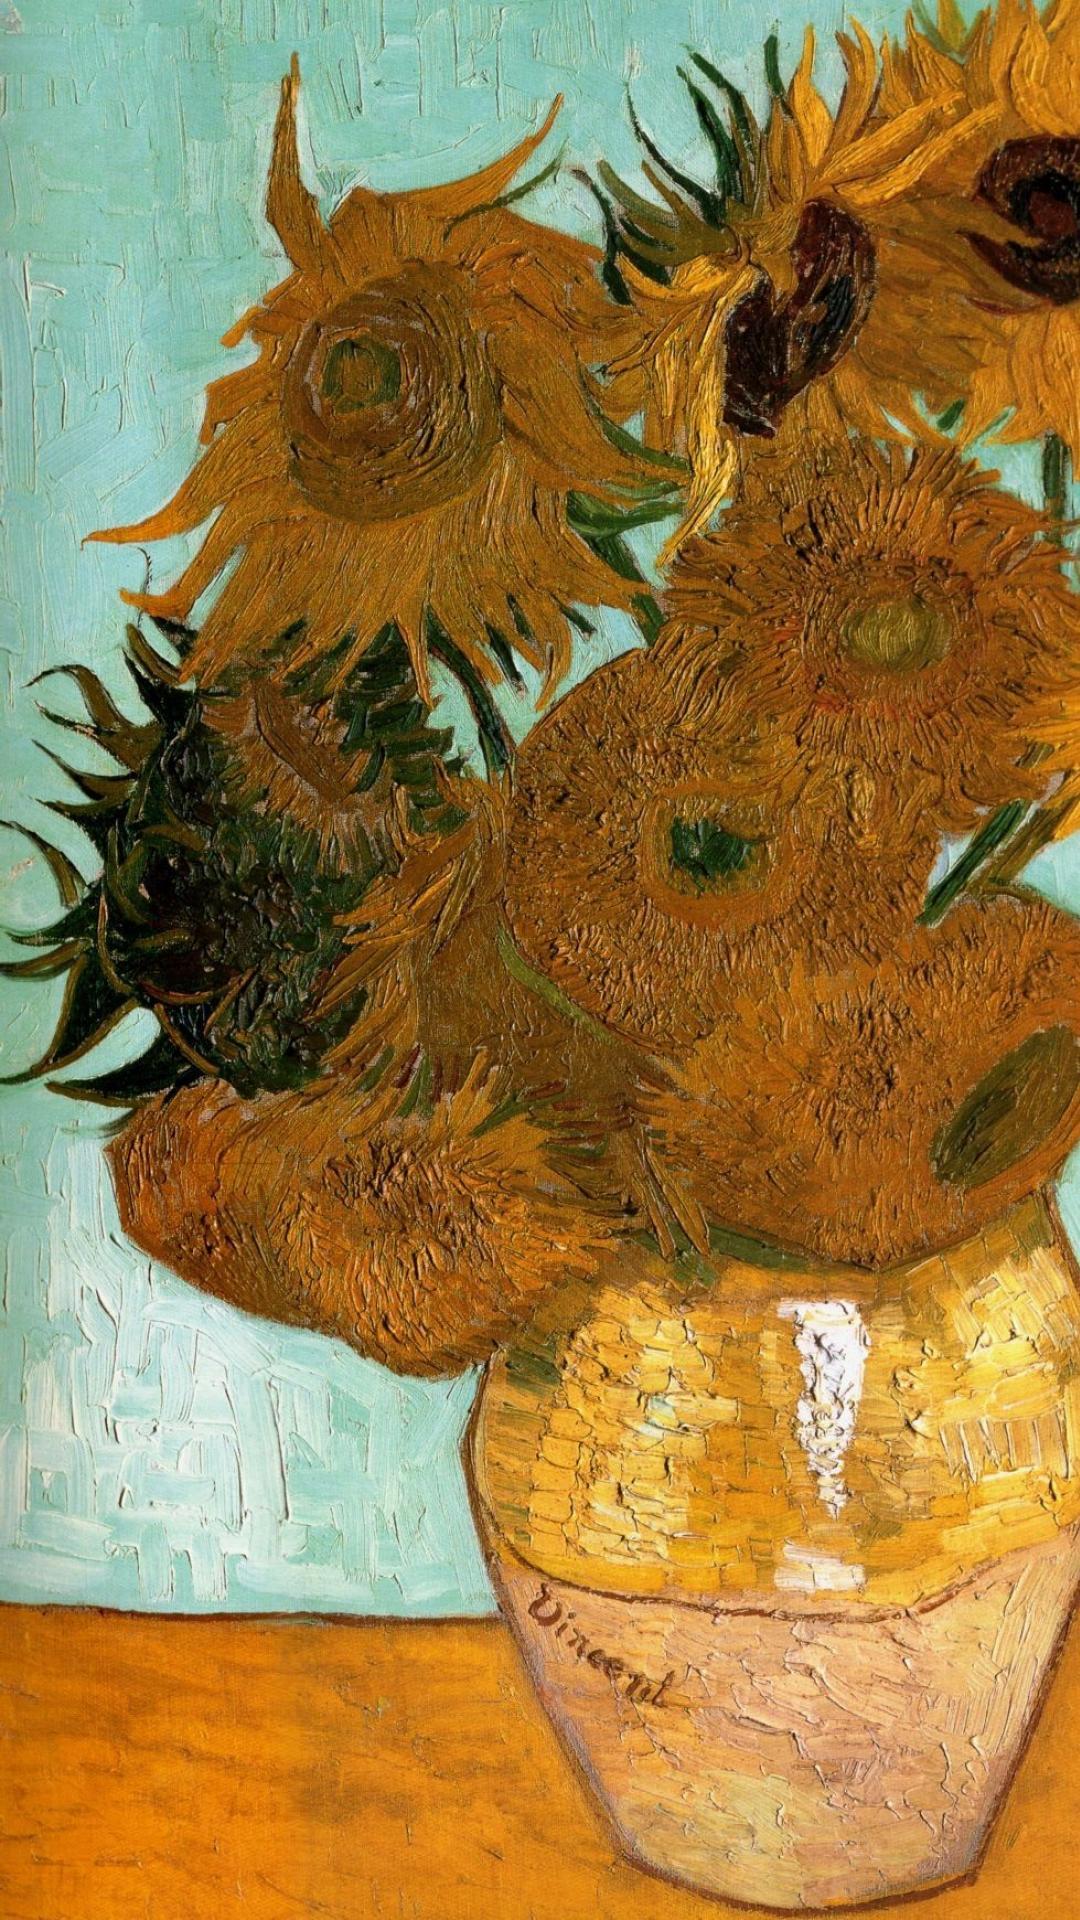 Sunflowers Van Gogh Iphone X 1884994 Hd Wallpaper